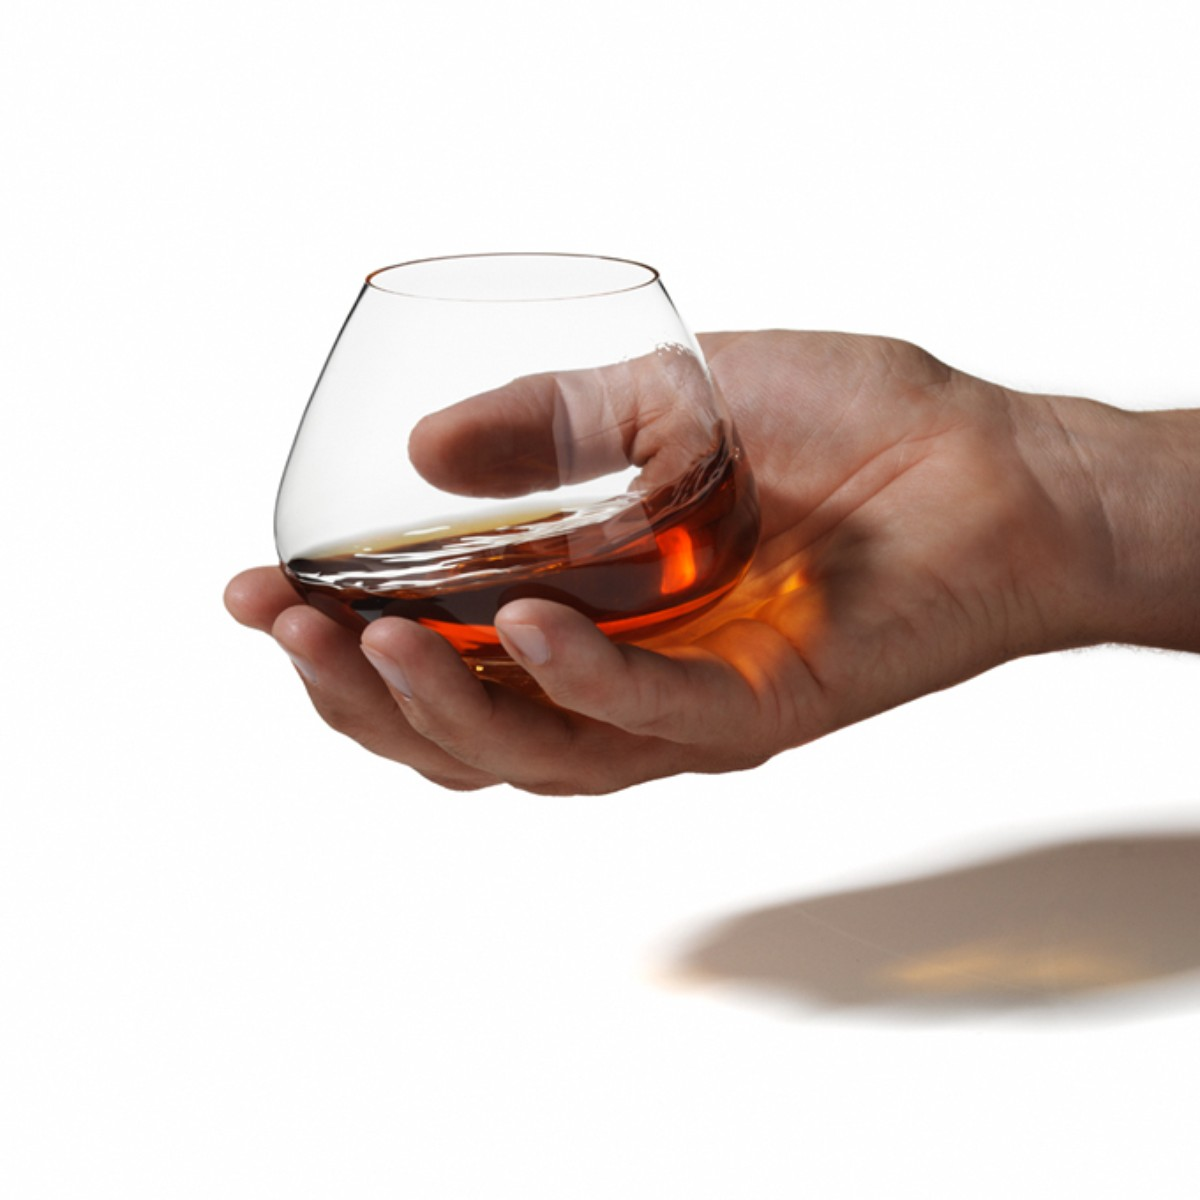 0u-00001862-cognac-glass-3_display1200